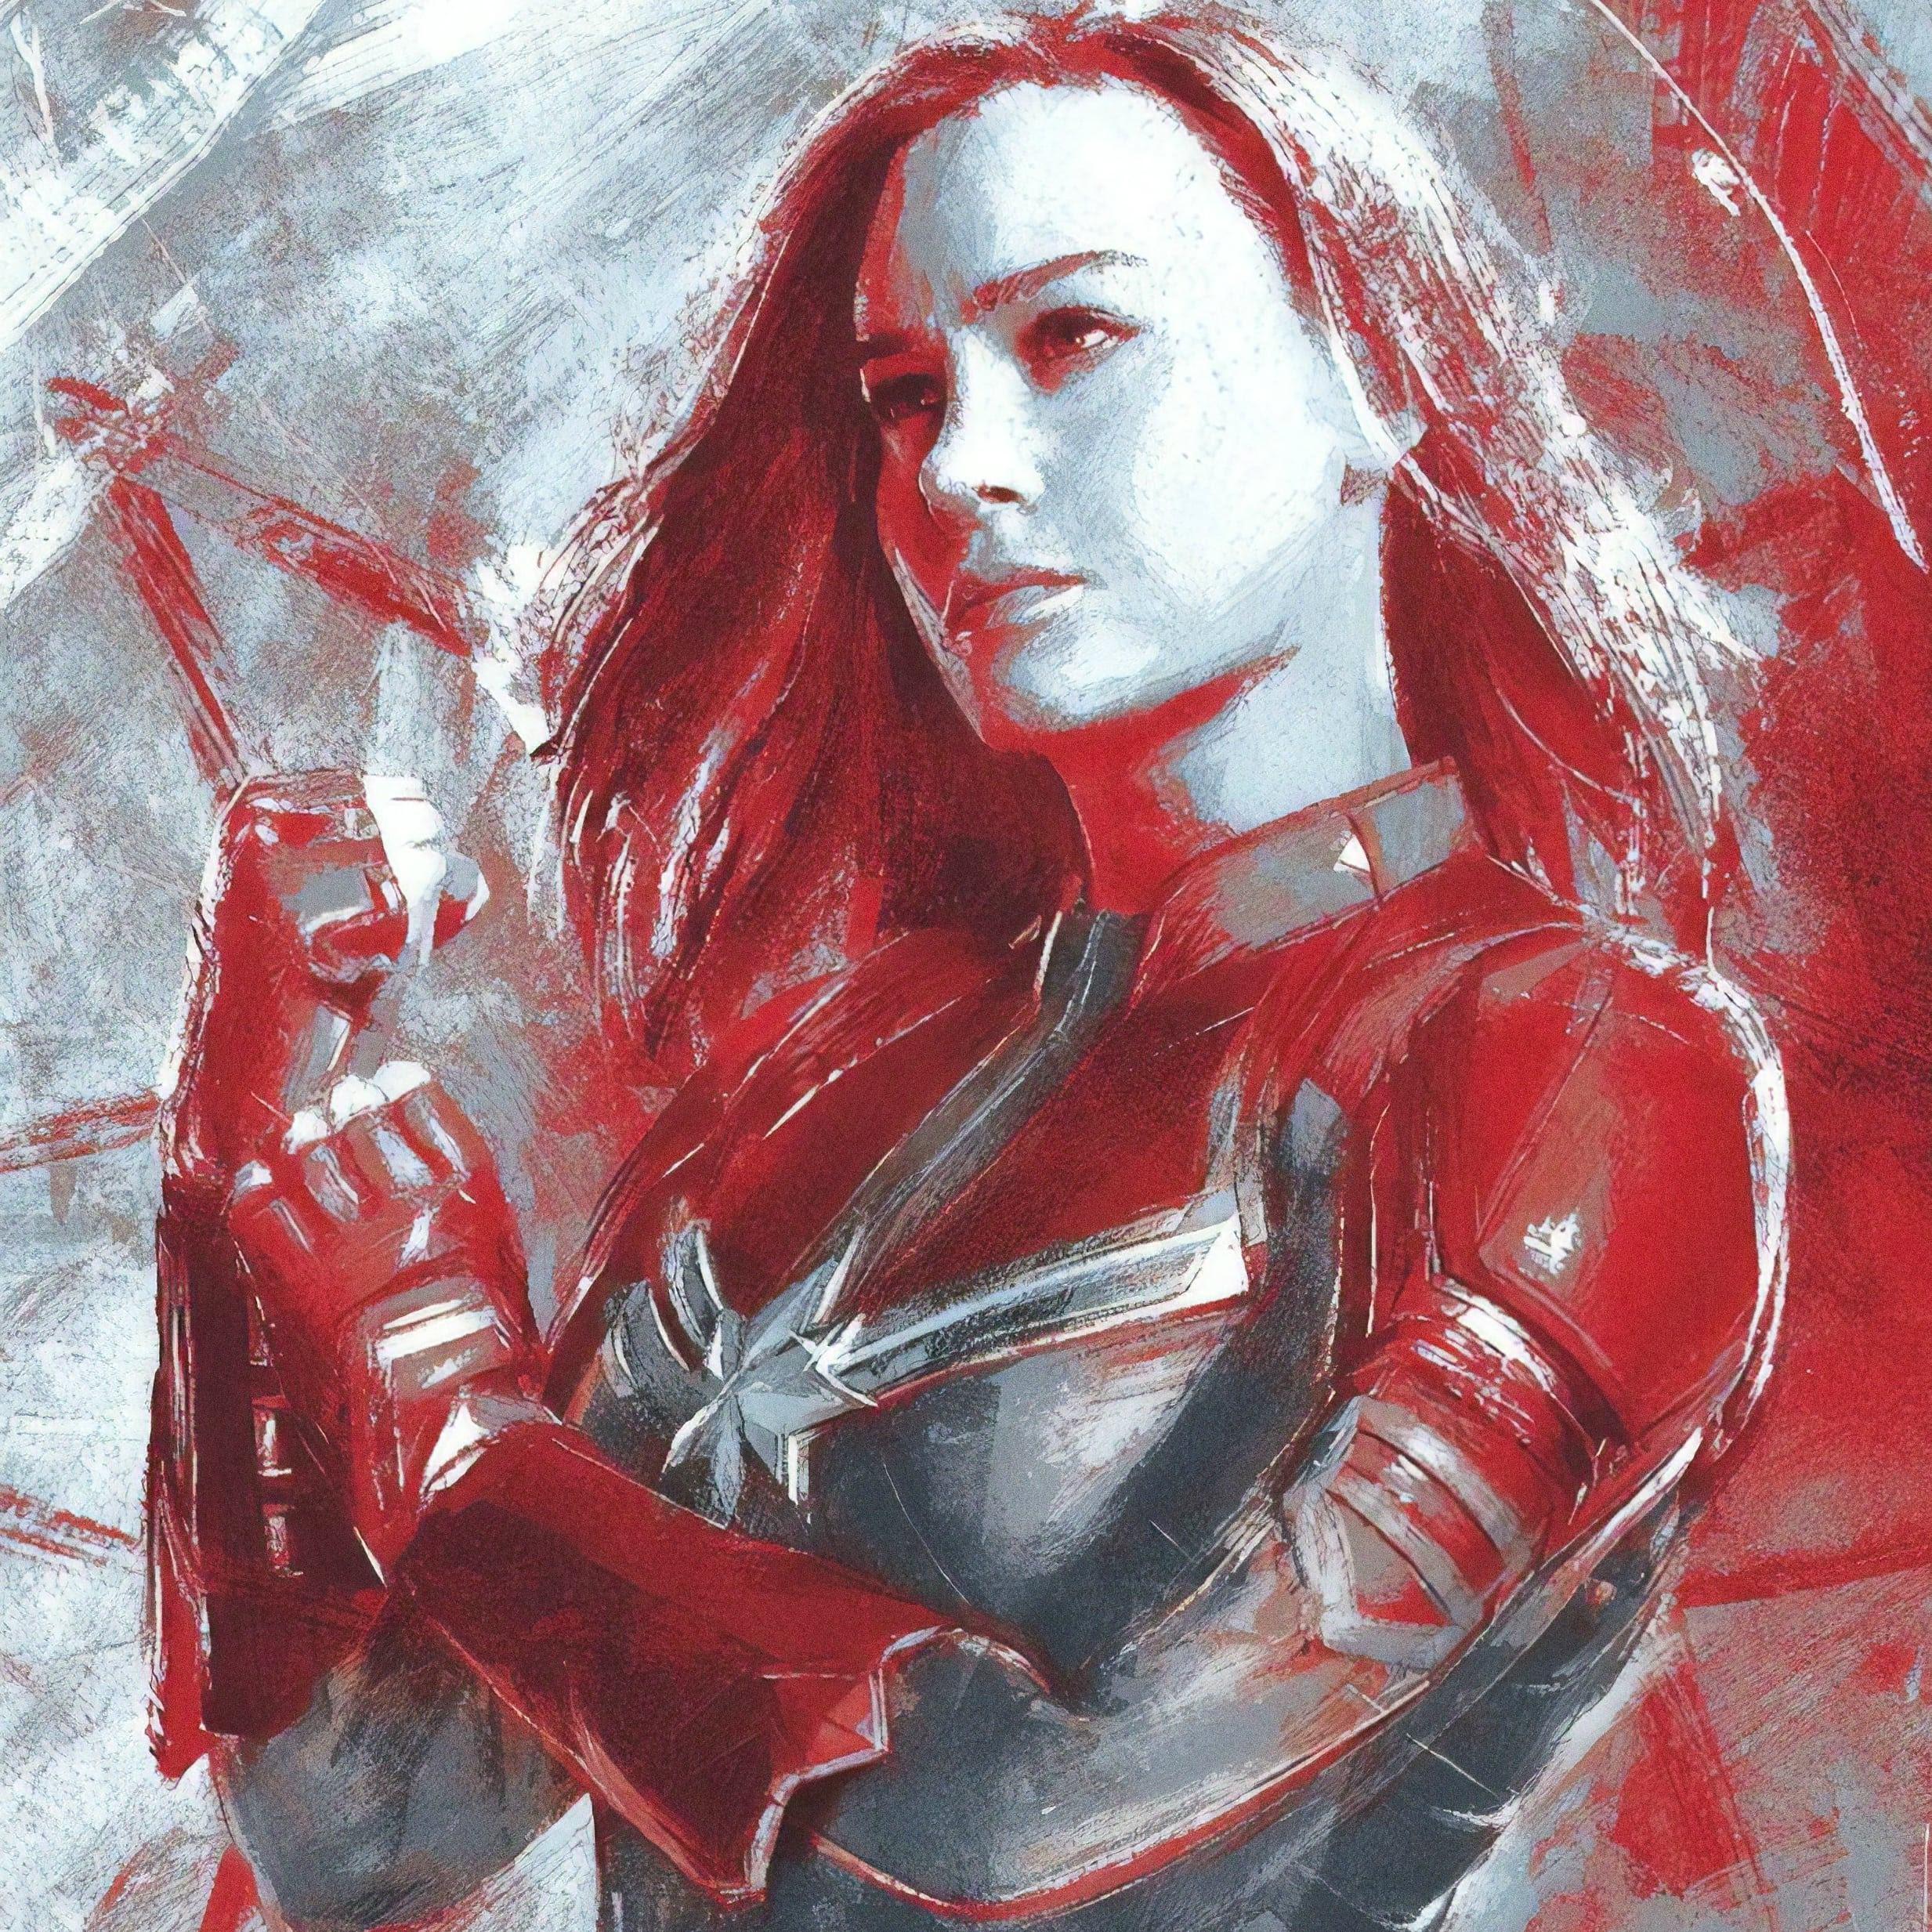 Avengers Endgame Runtime : マーベルのヒーロー大集合映画「アベンジャーズ」のクライマックス大作「エンドゲーム」のシネマティック・ユニバース史上最長の上映時間が、ついに確定 ! !